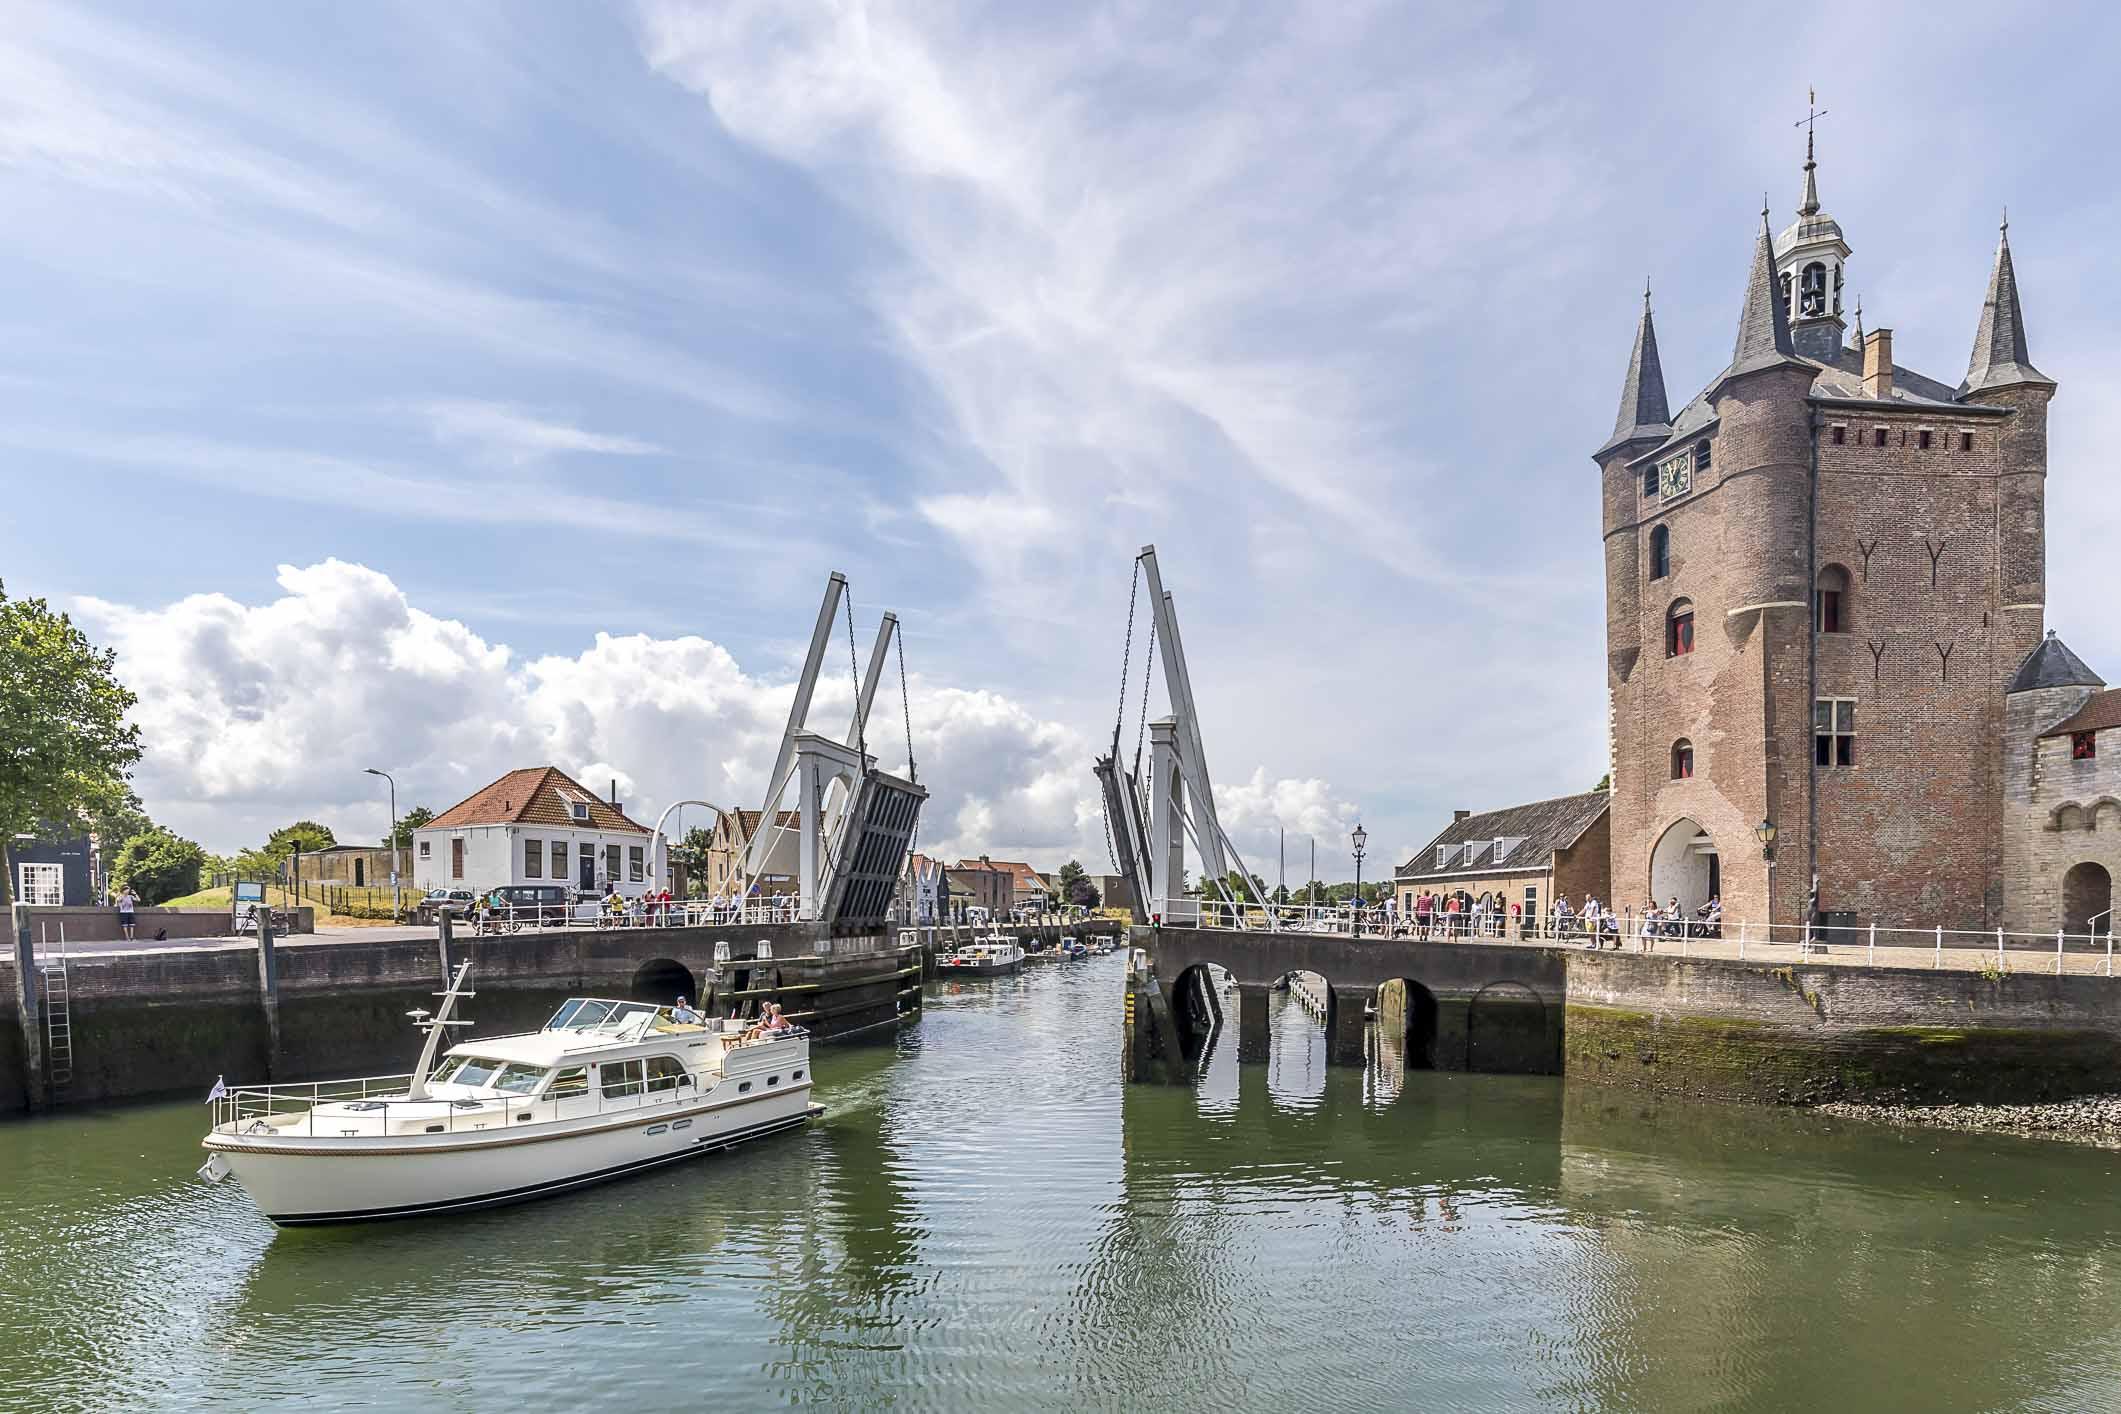 Route 1; Vlaanderen en Pas de Calais